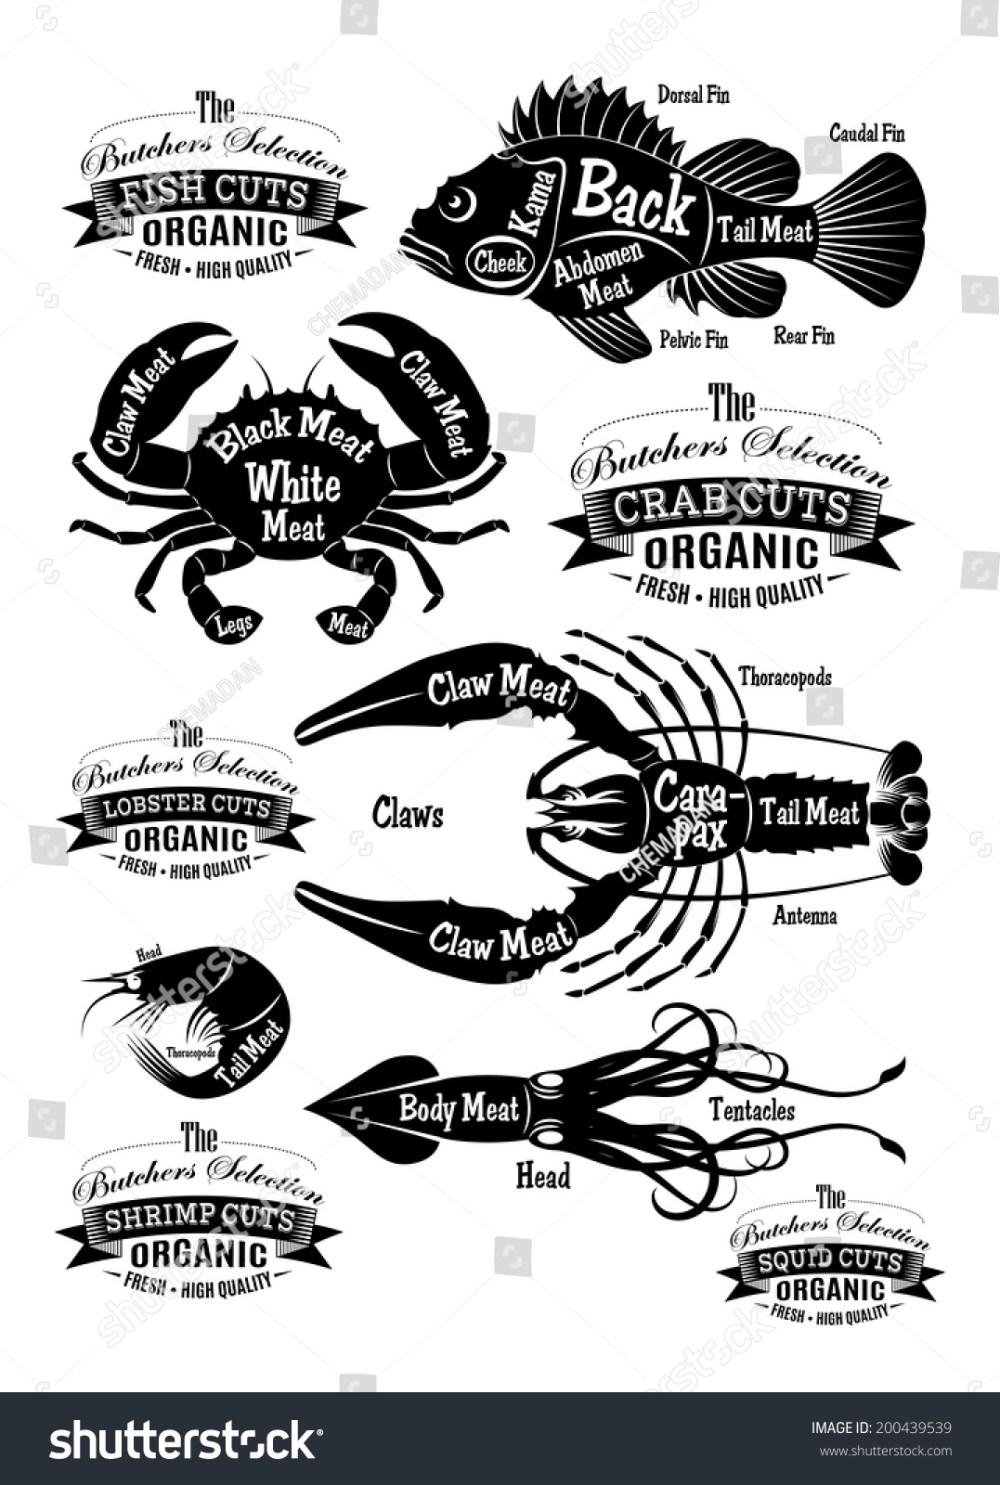 medium resolution of vector set of diagram cut carcasses seafood